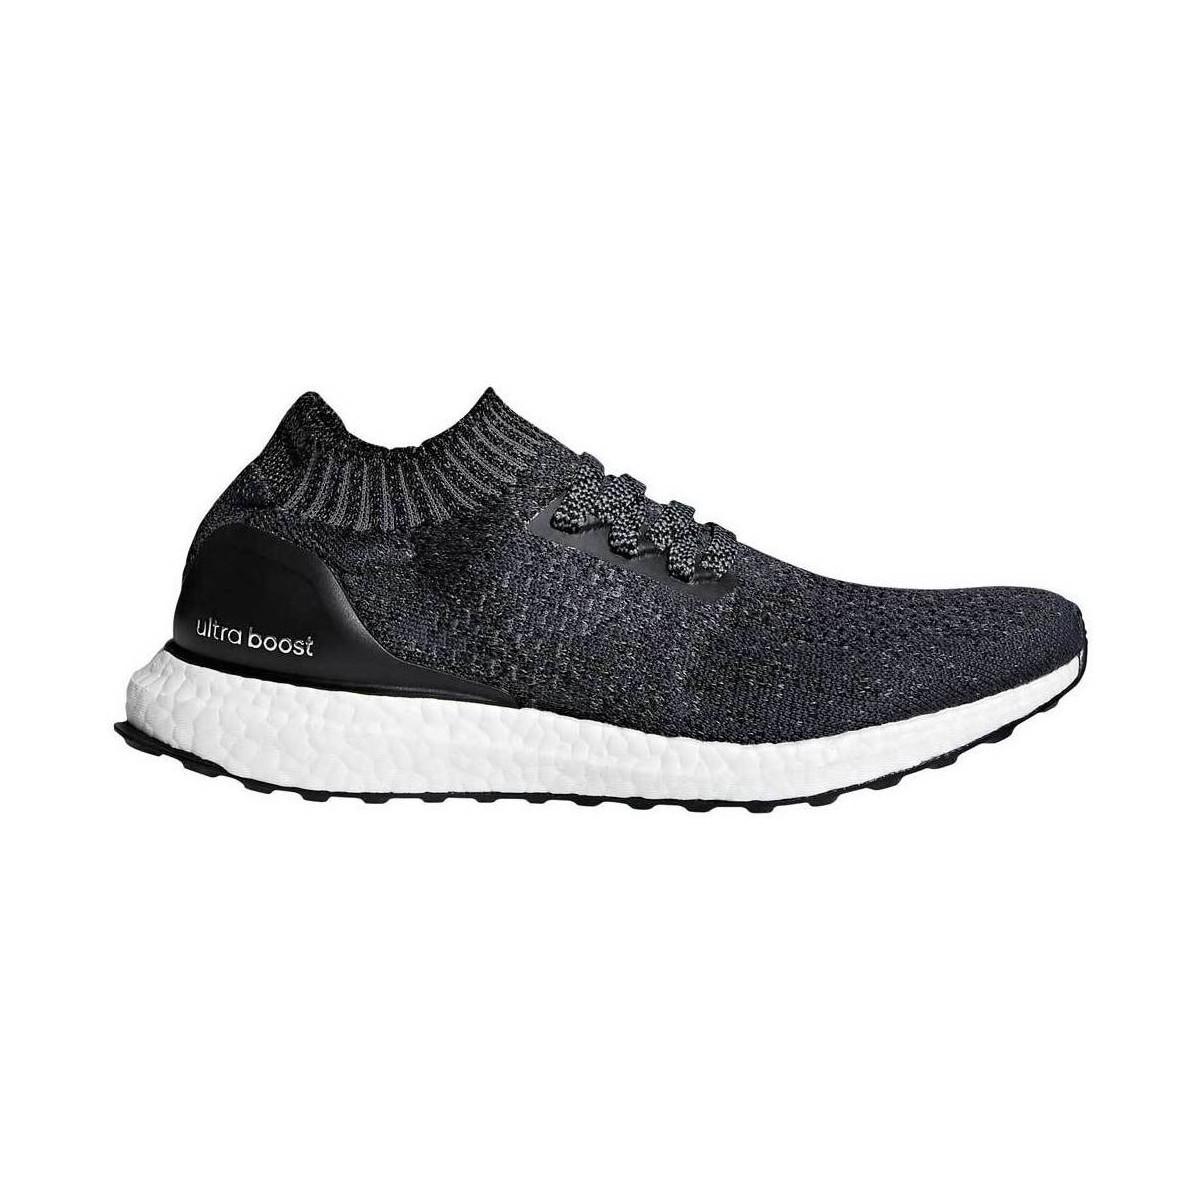 3d8e5d48e3b30 adidas. Black Ultraboost Uncaged Shoes ...